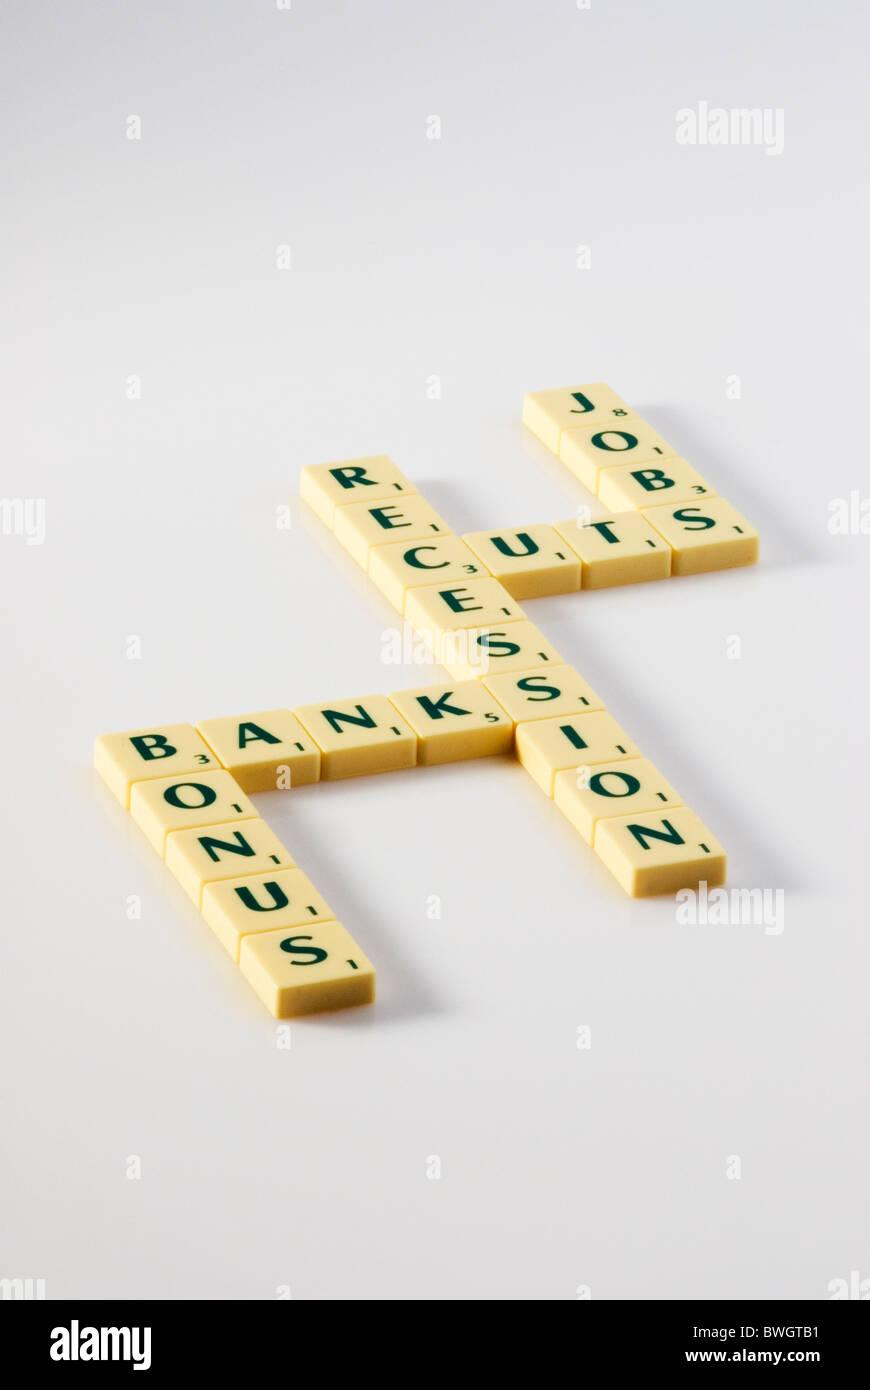 Recession, banks and bonuses. - Stock Image